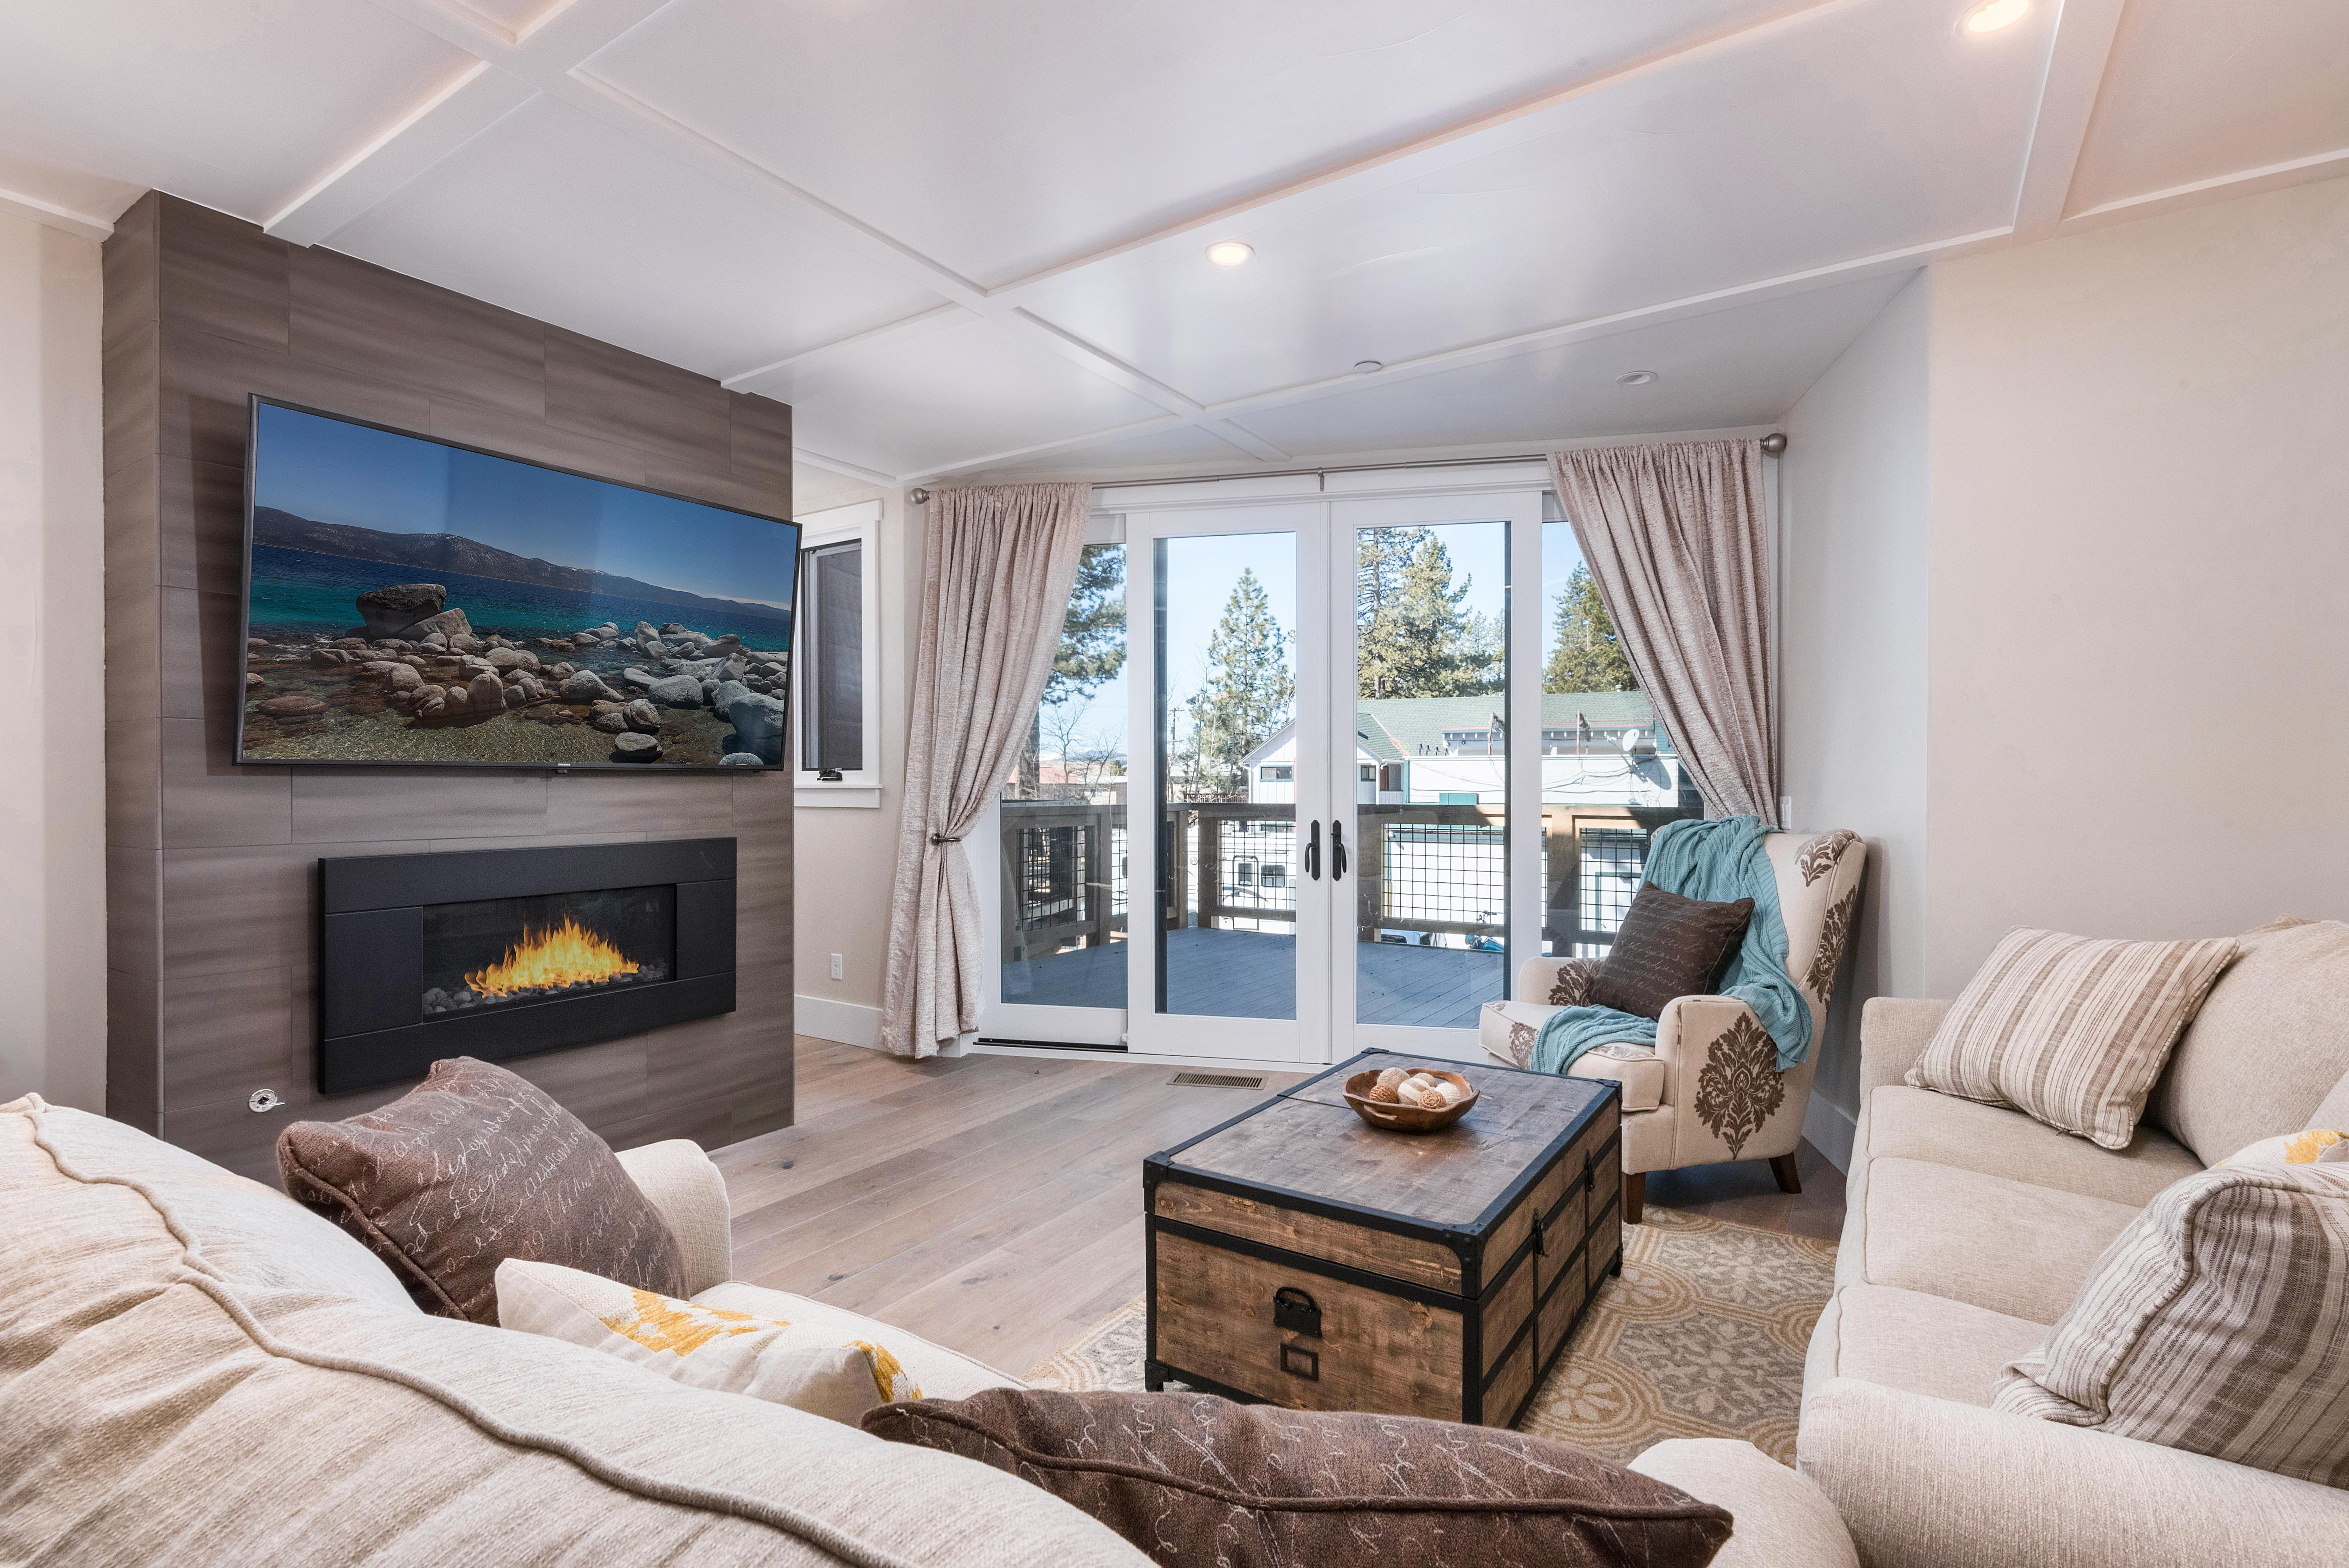 Kings Beach CA Vacation Rental Welcome to Kings